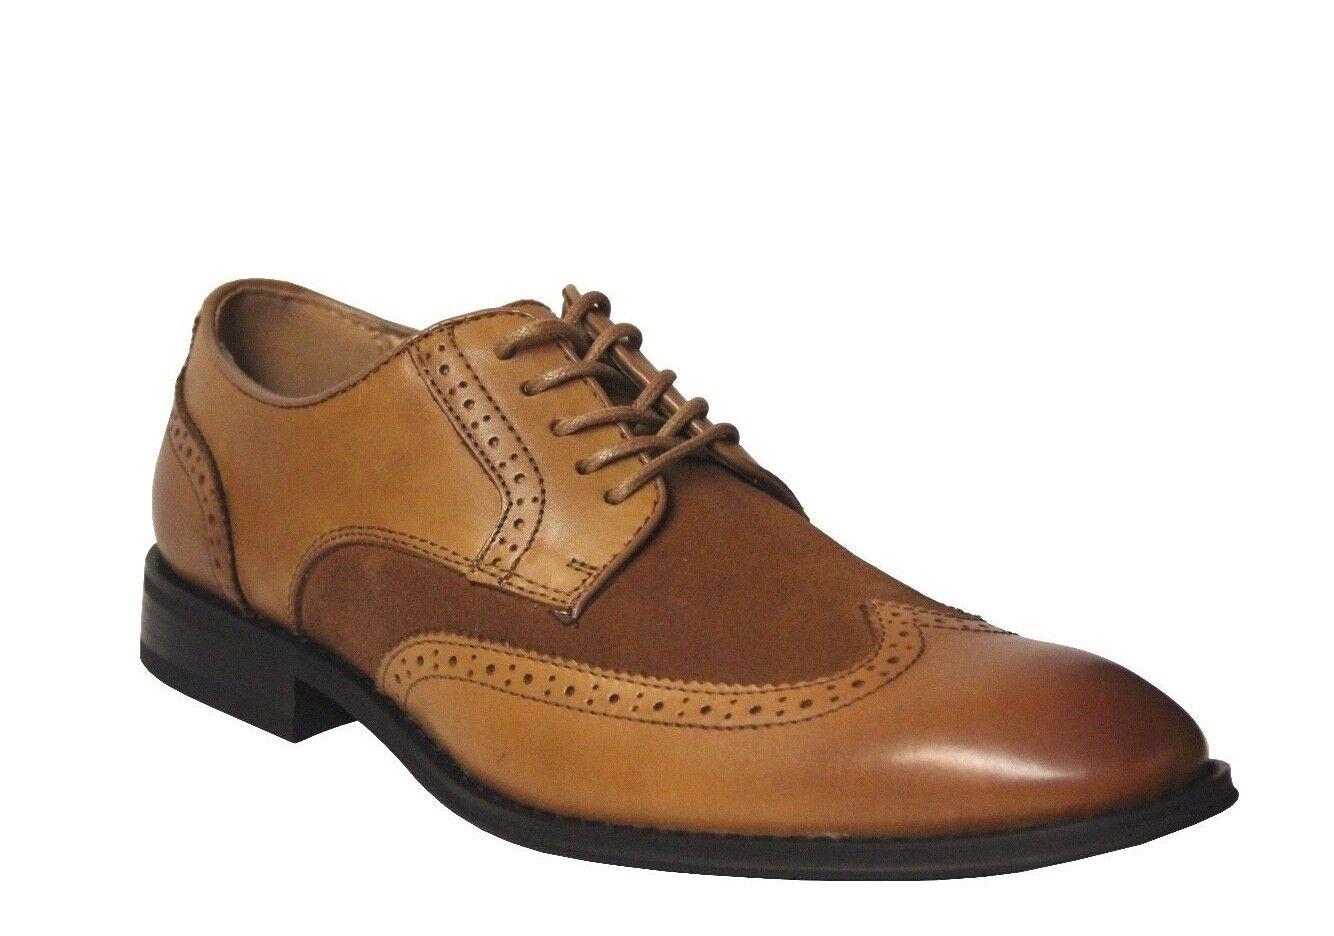 La Milano Homme Tan Cuir Daim Bout D'Aile Chaussures A11408